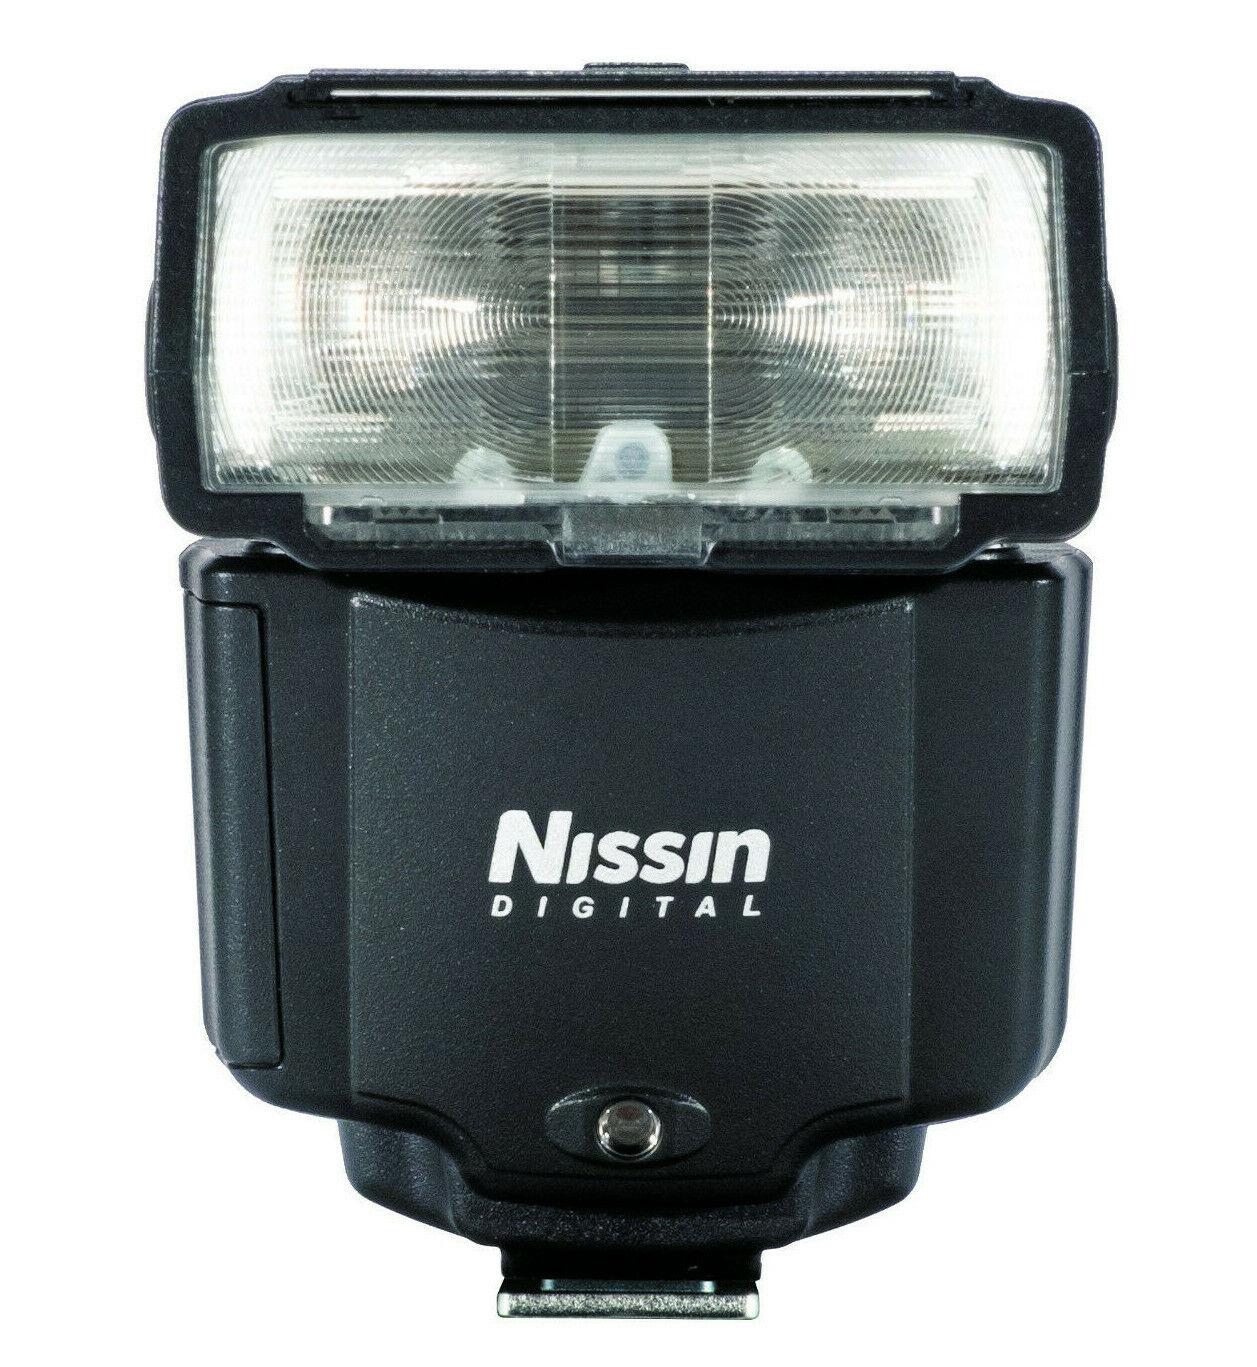 Blitzgerät Nissin i400 Blitz Flash Sony / Nikon / Canon / Fuji / Fujifilm / MFT